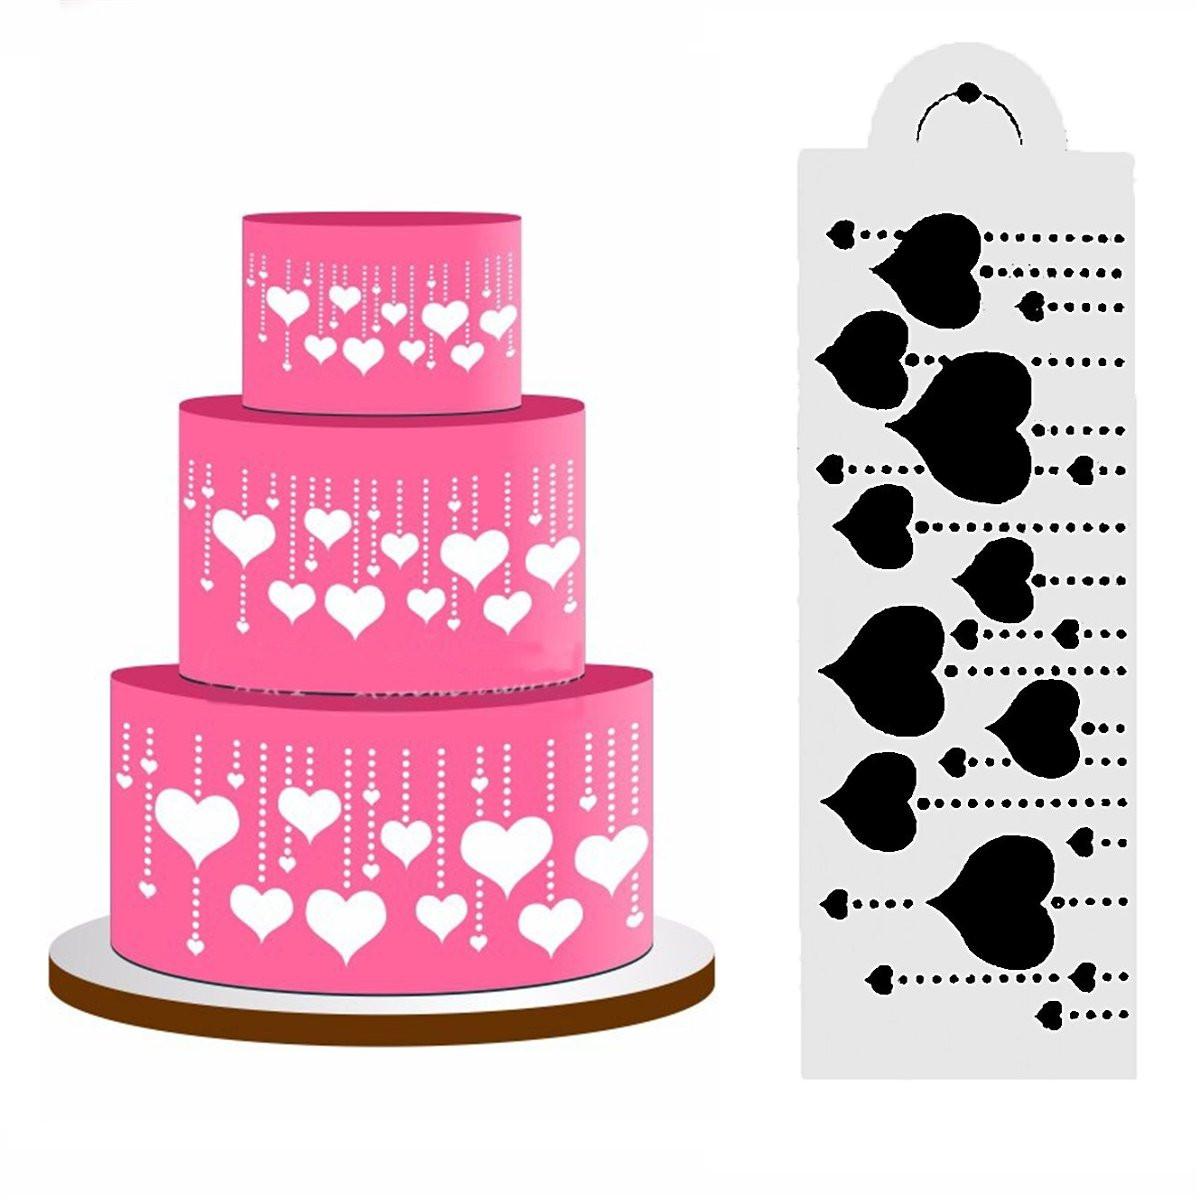 Cake Craft And Decoration Download Free : Heart Side Cake Stencil Fondant Designer Decorating Craft ...